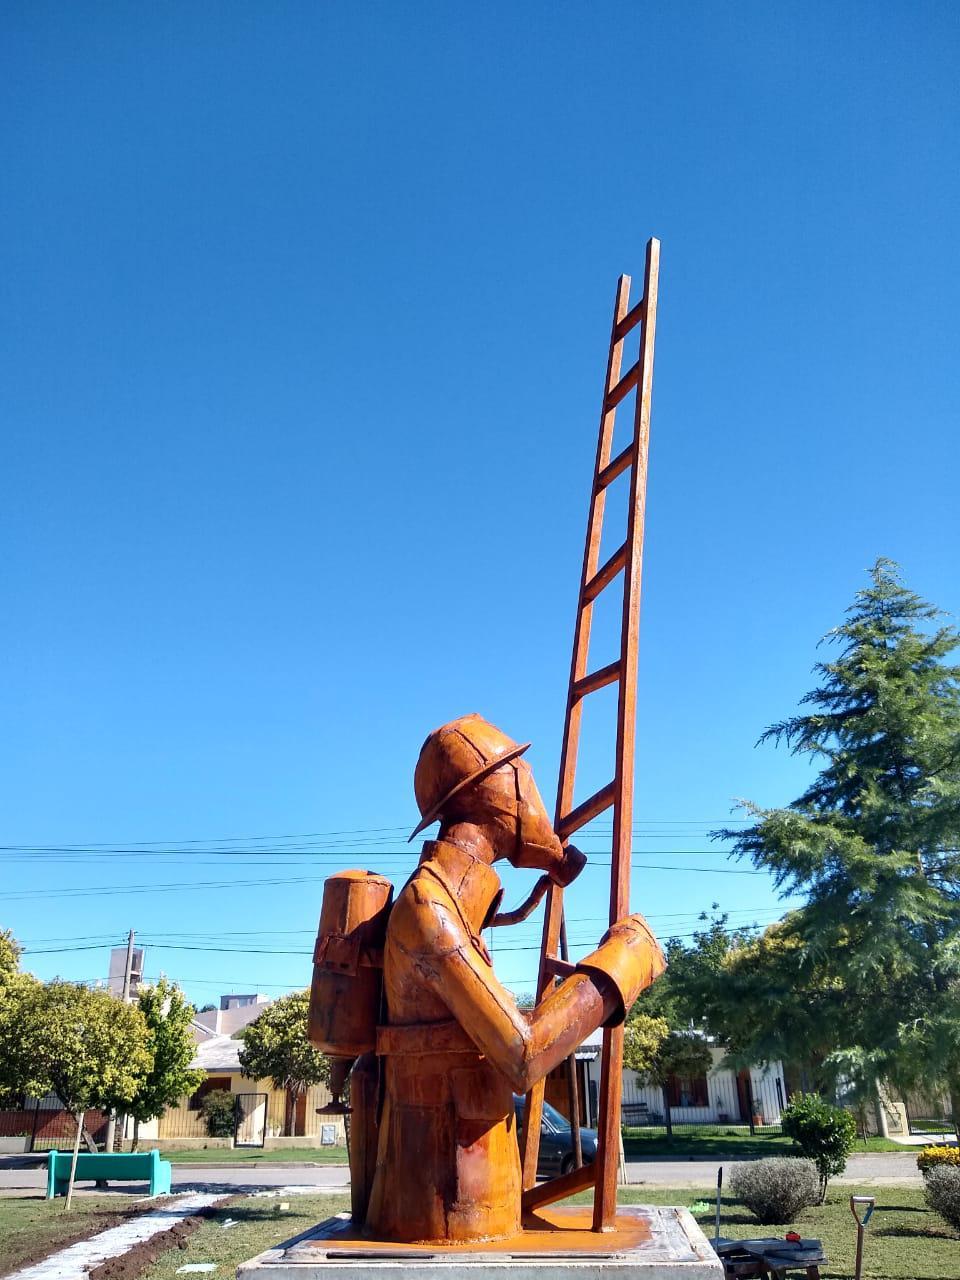 bomberos monte cristo (2)